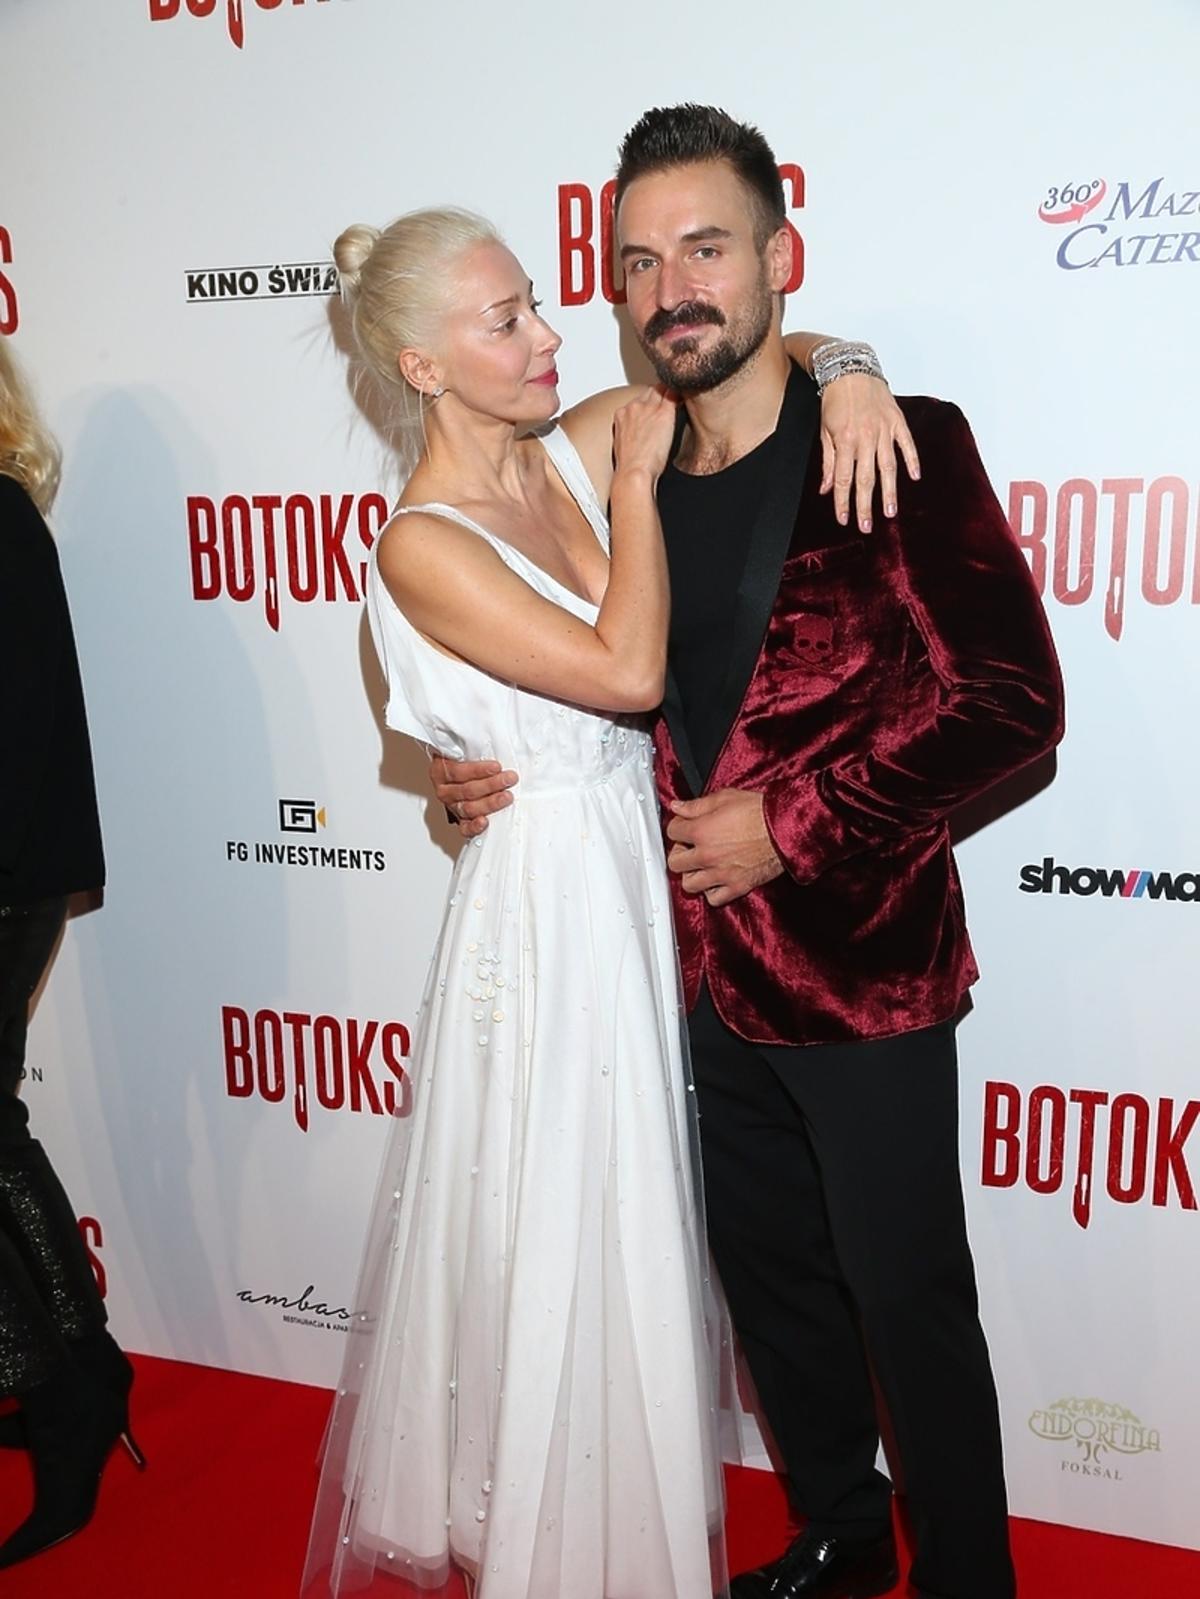 Piotr Stramowski i Kasia Warnke na premierze filmu Botoks